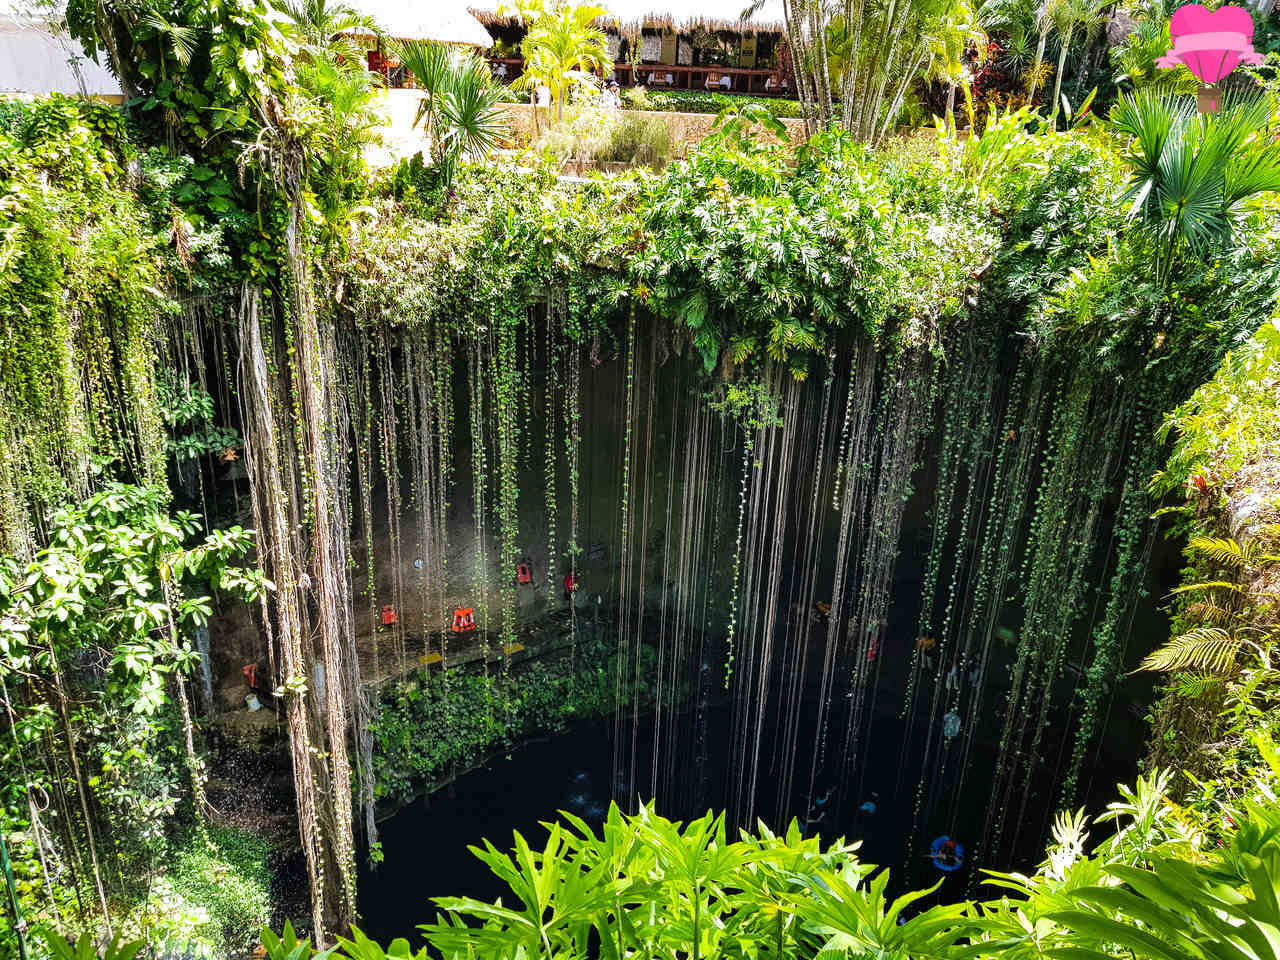 cenote-Ik-kil-mexico-cancun